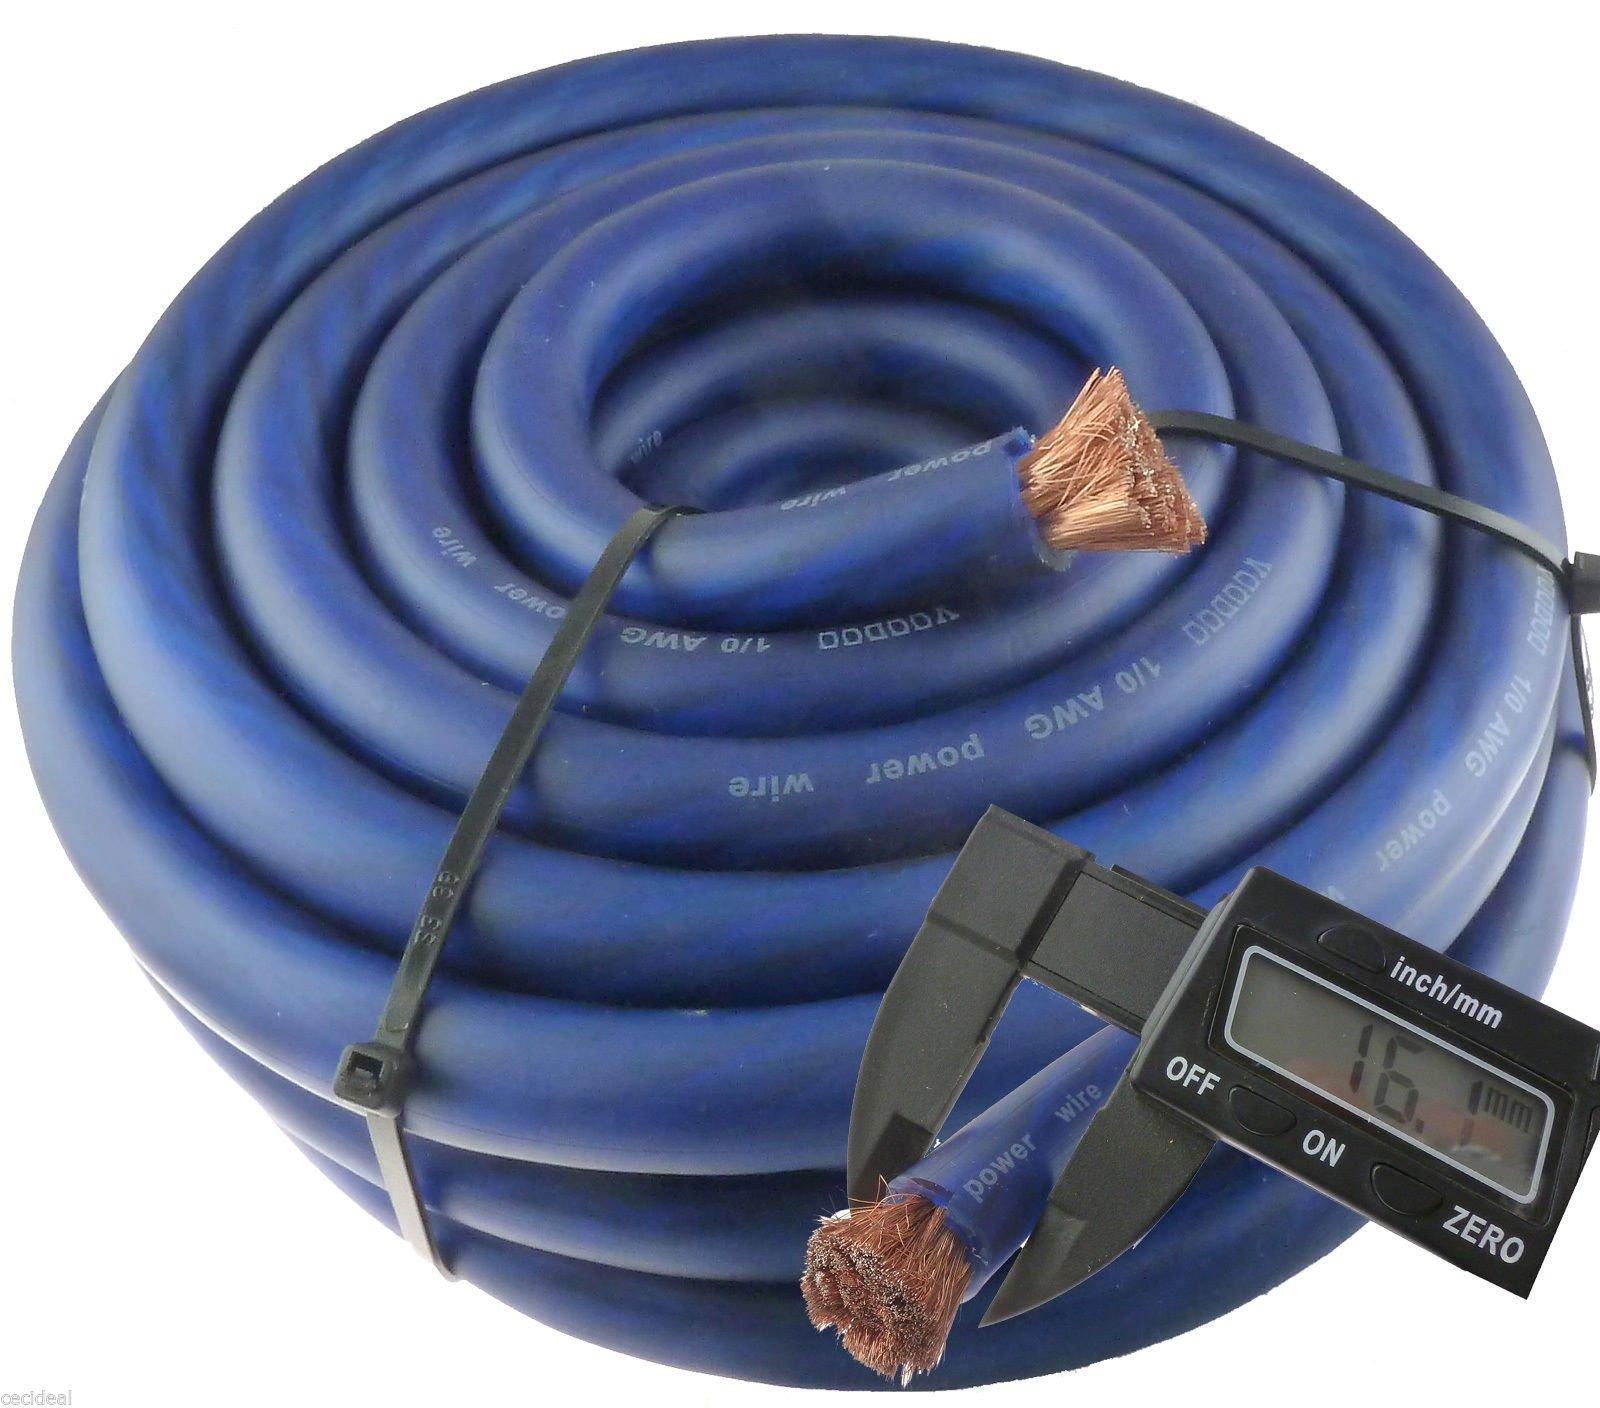 0 Gauge 25' Wire Hyperflex Amplifier Blue Ga 1/0 Amp Power/Ground Cable 25 Ft by Voodoo HyperFlex